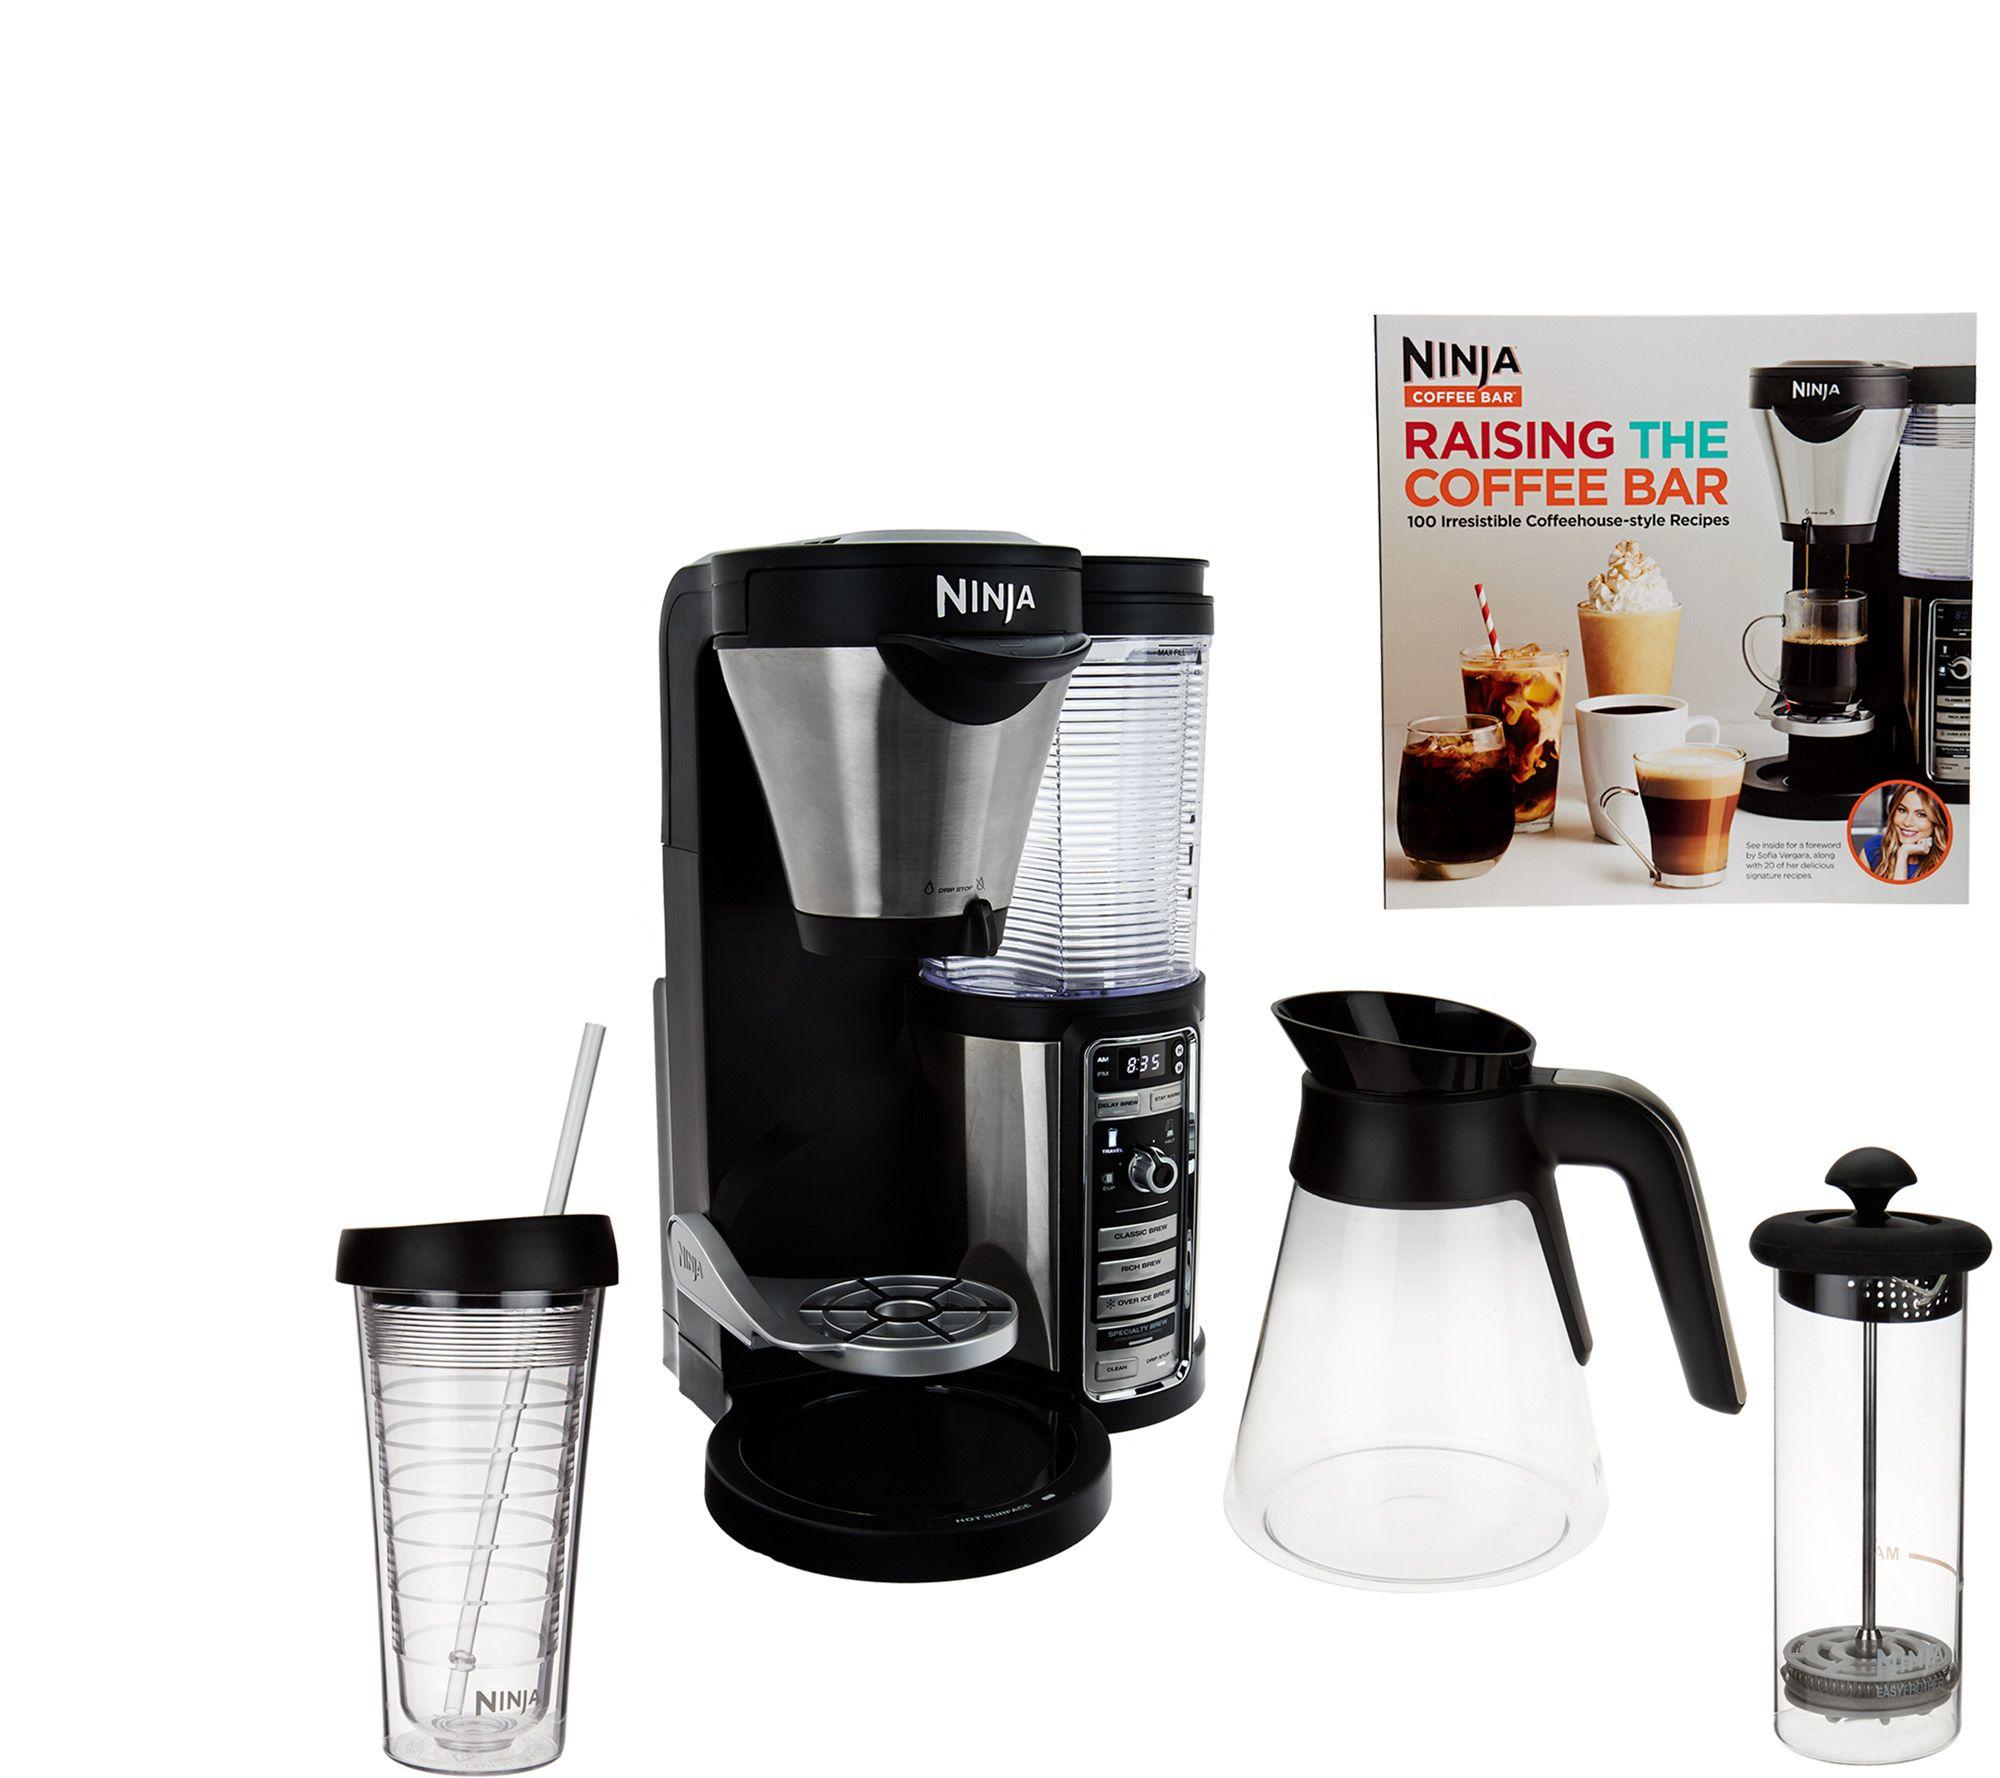 Ninja Coffee Bar Auto-iQ Coffee Maker w/ Glass Carafe & Recipe Book - Page 1 QVC.com